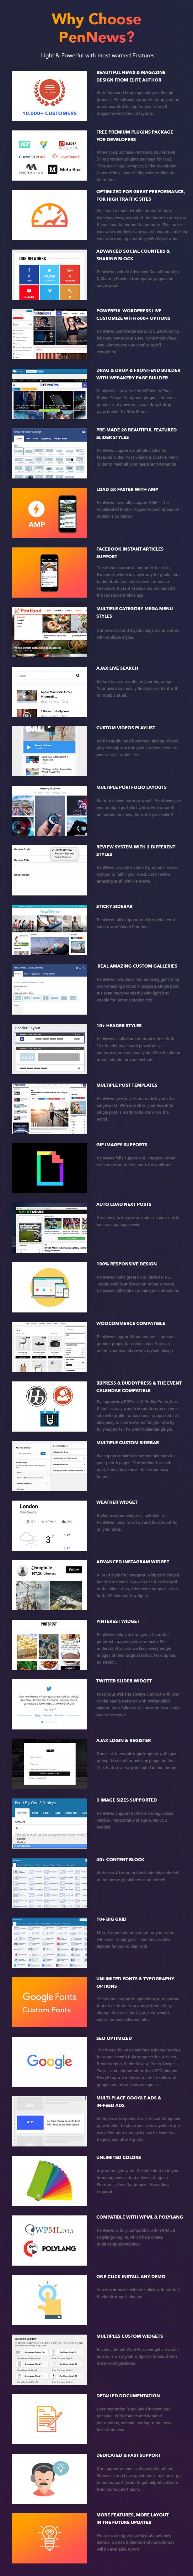 P29 WhyChoose - PenNews - Multi-Purpose AMP WordPress Theme